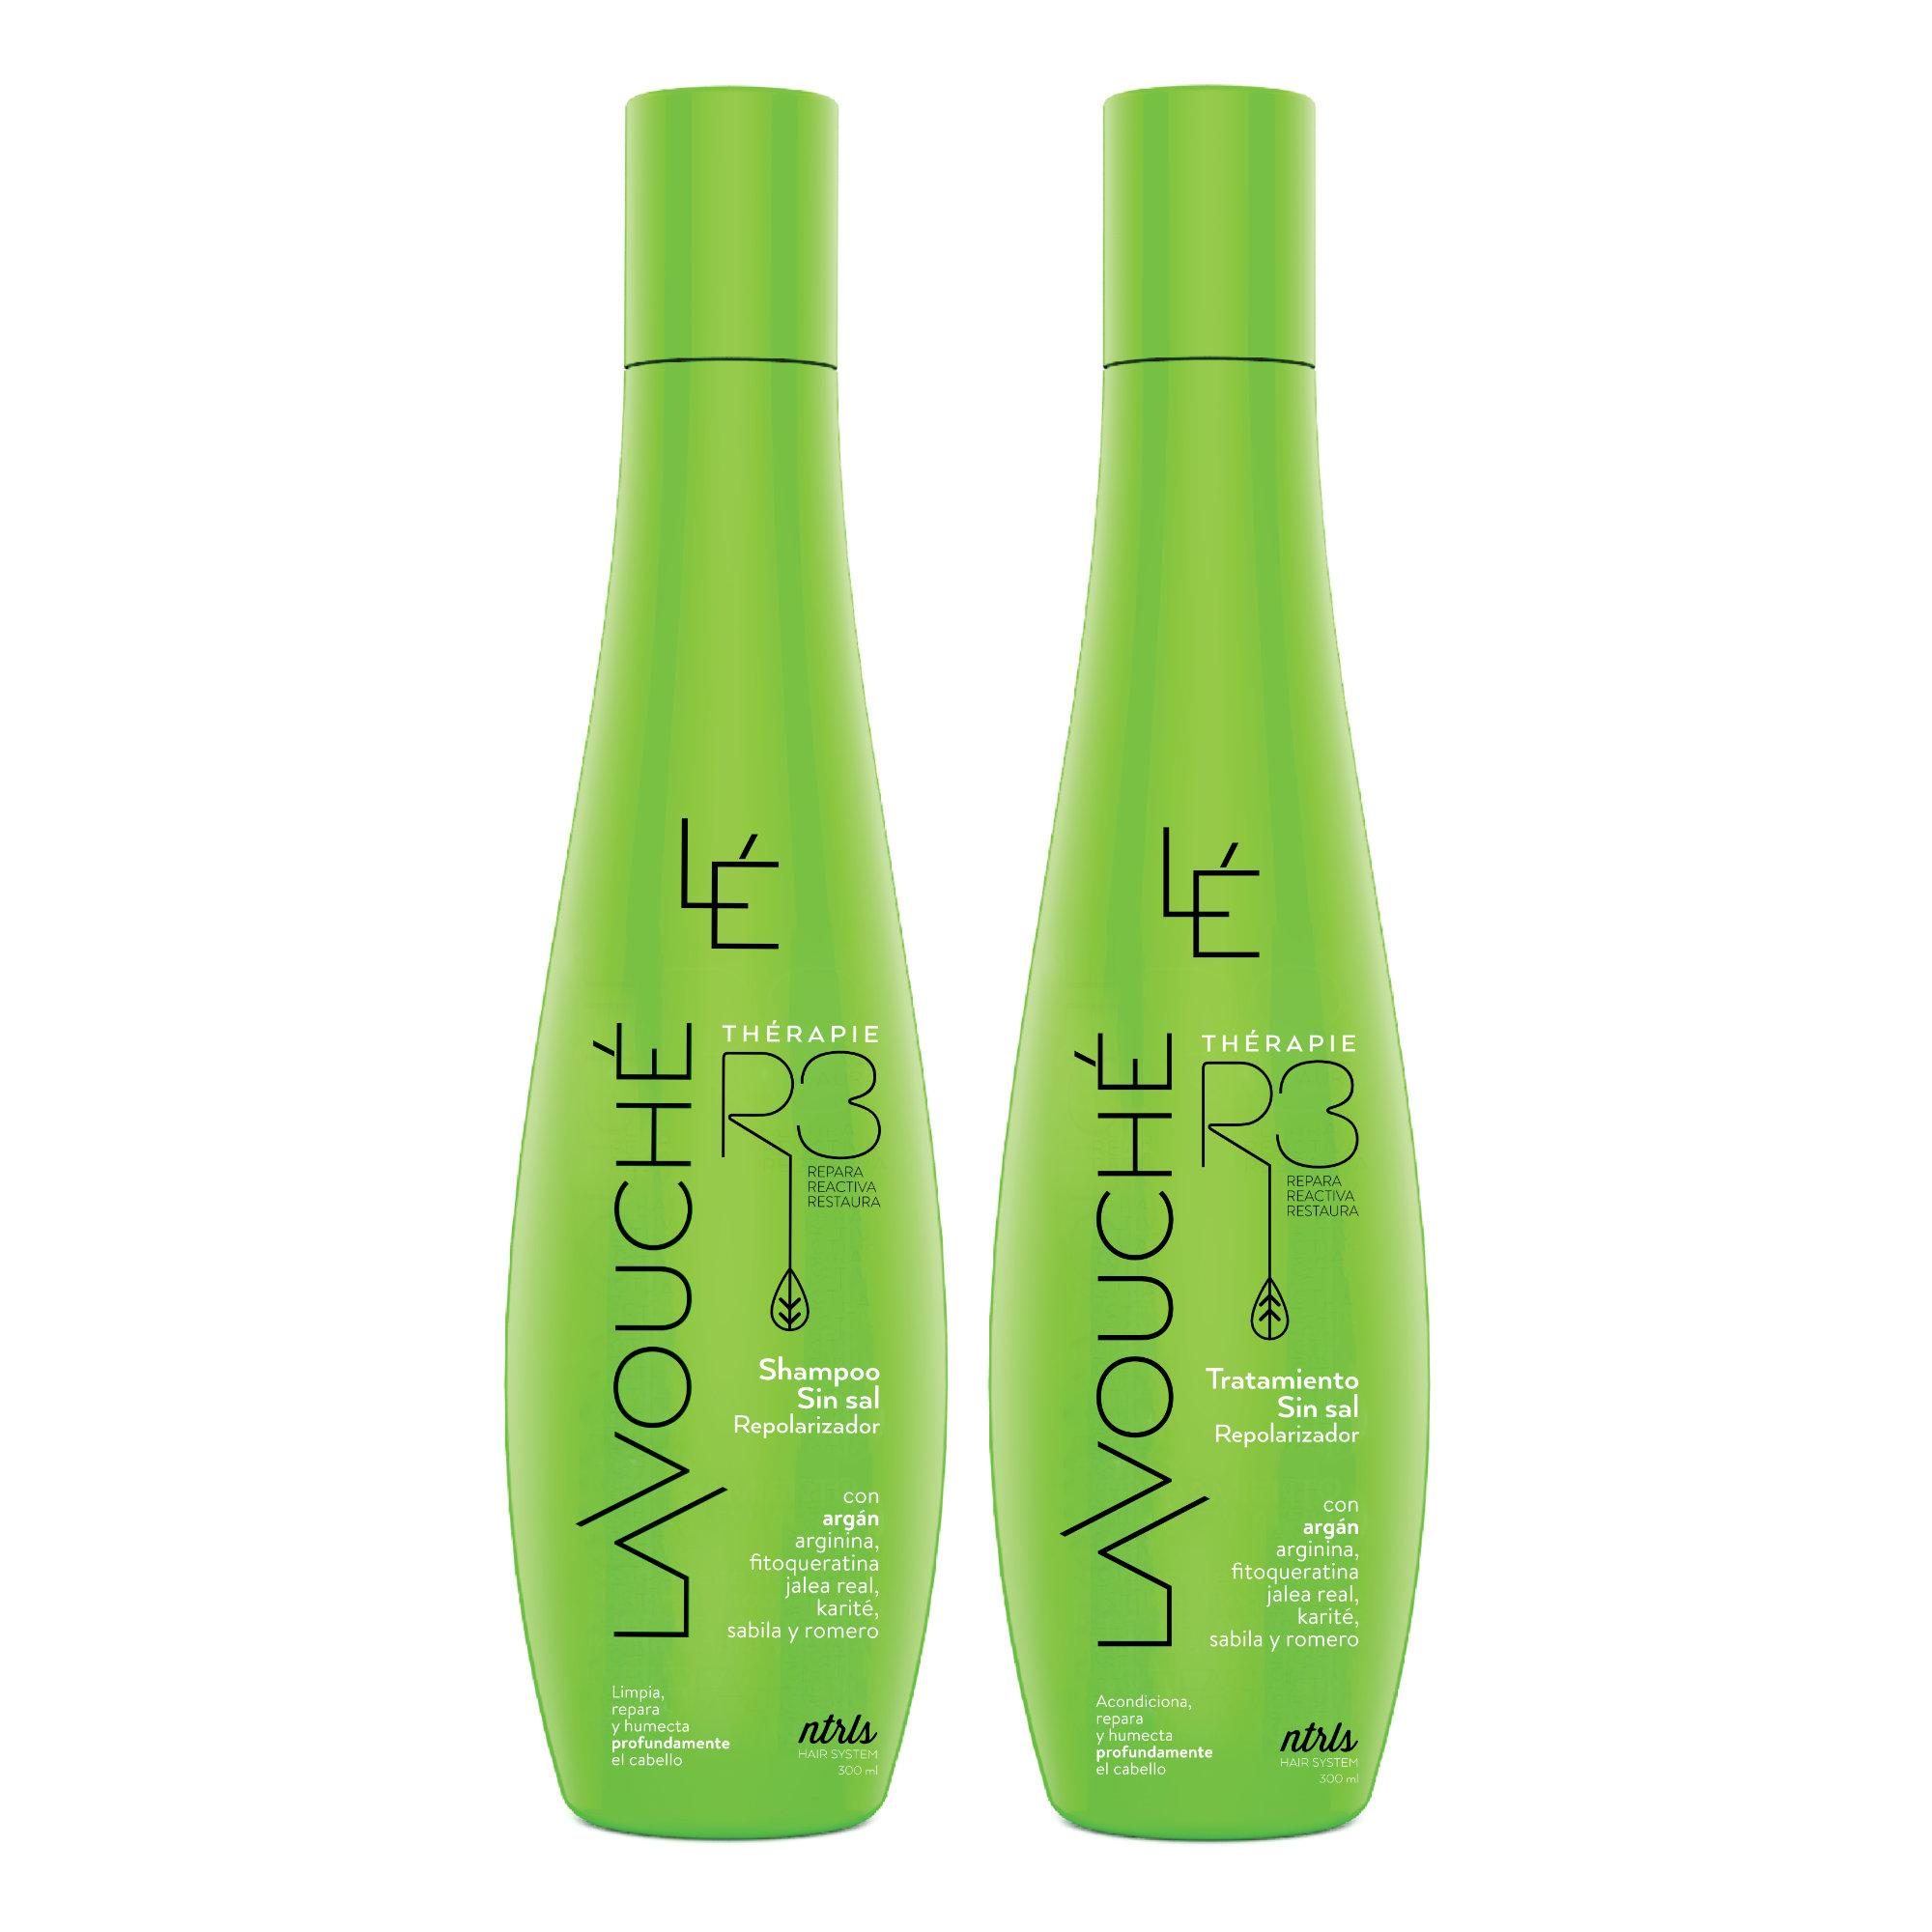 Therapy R3 Kit Shampoo y Tratamiento Repolarizador Lavouche